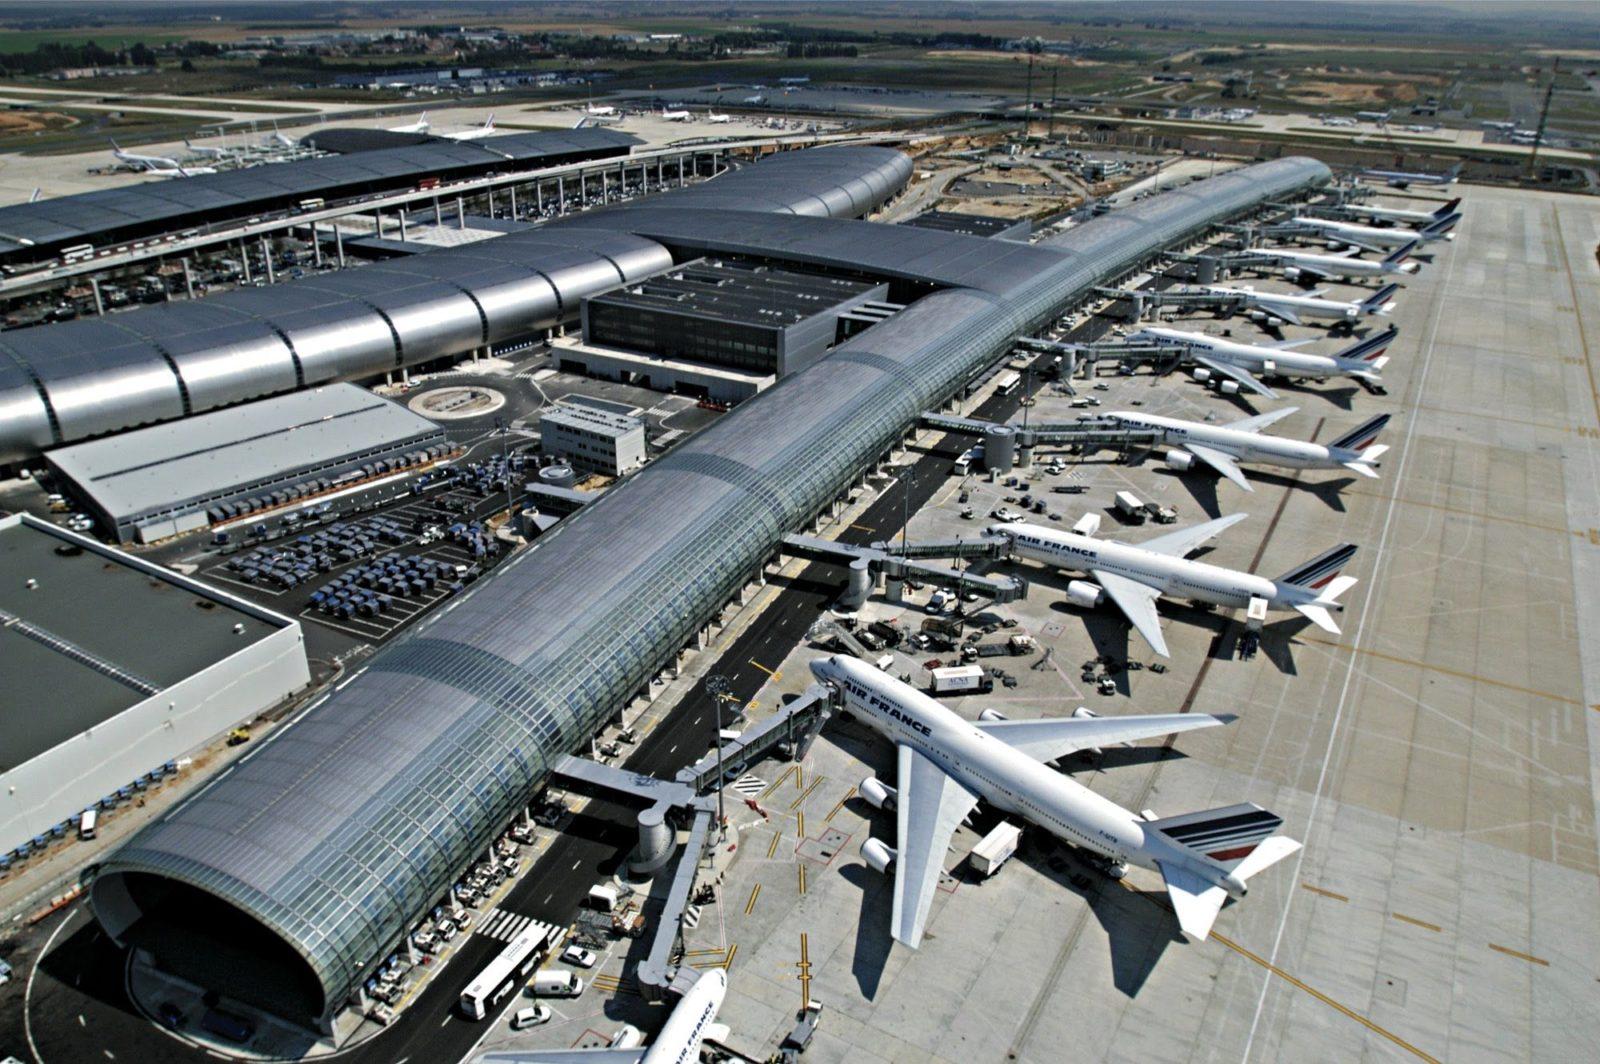 Аэропорт Париж Шарль де Голль